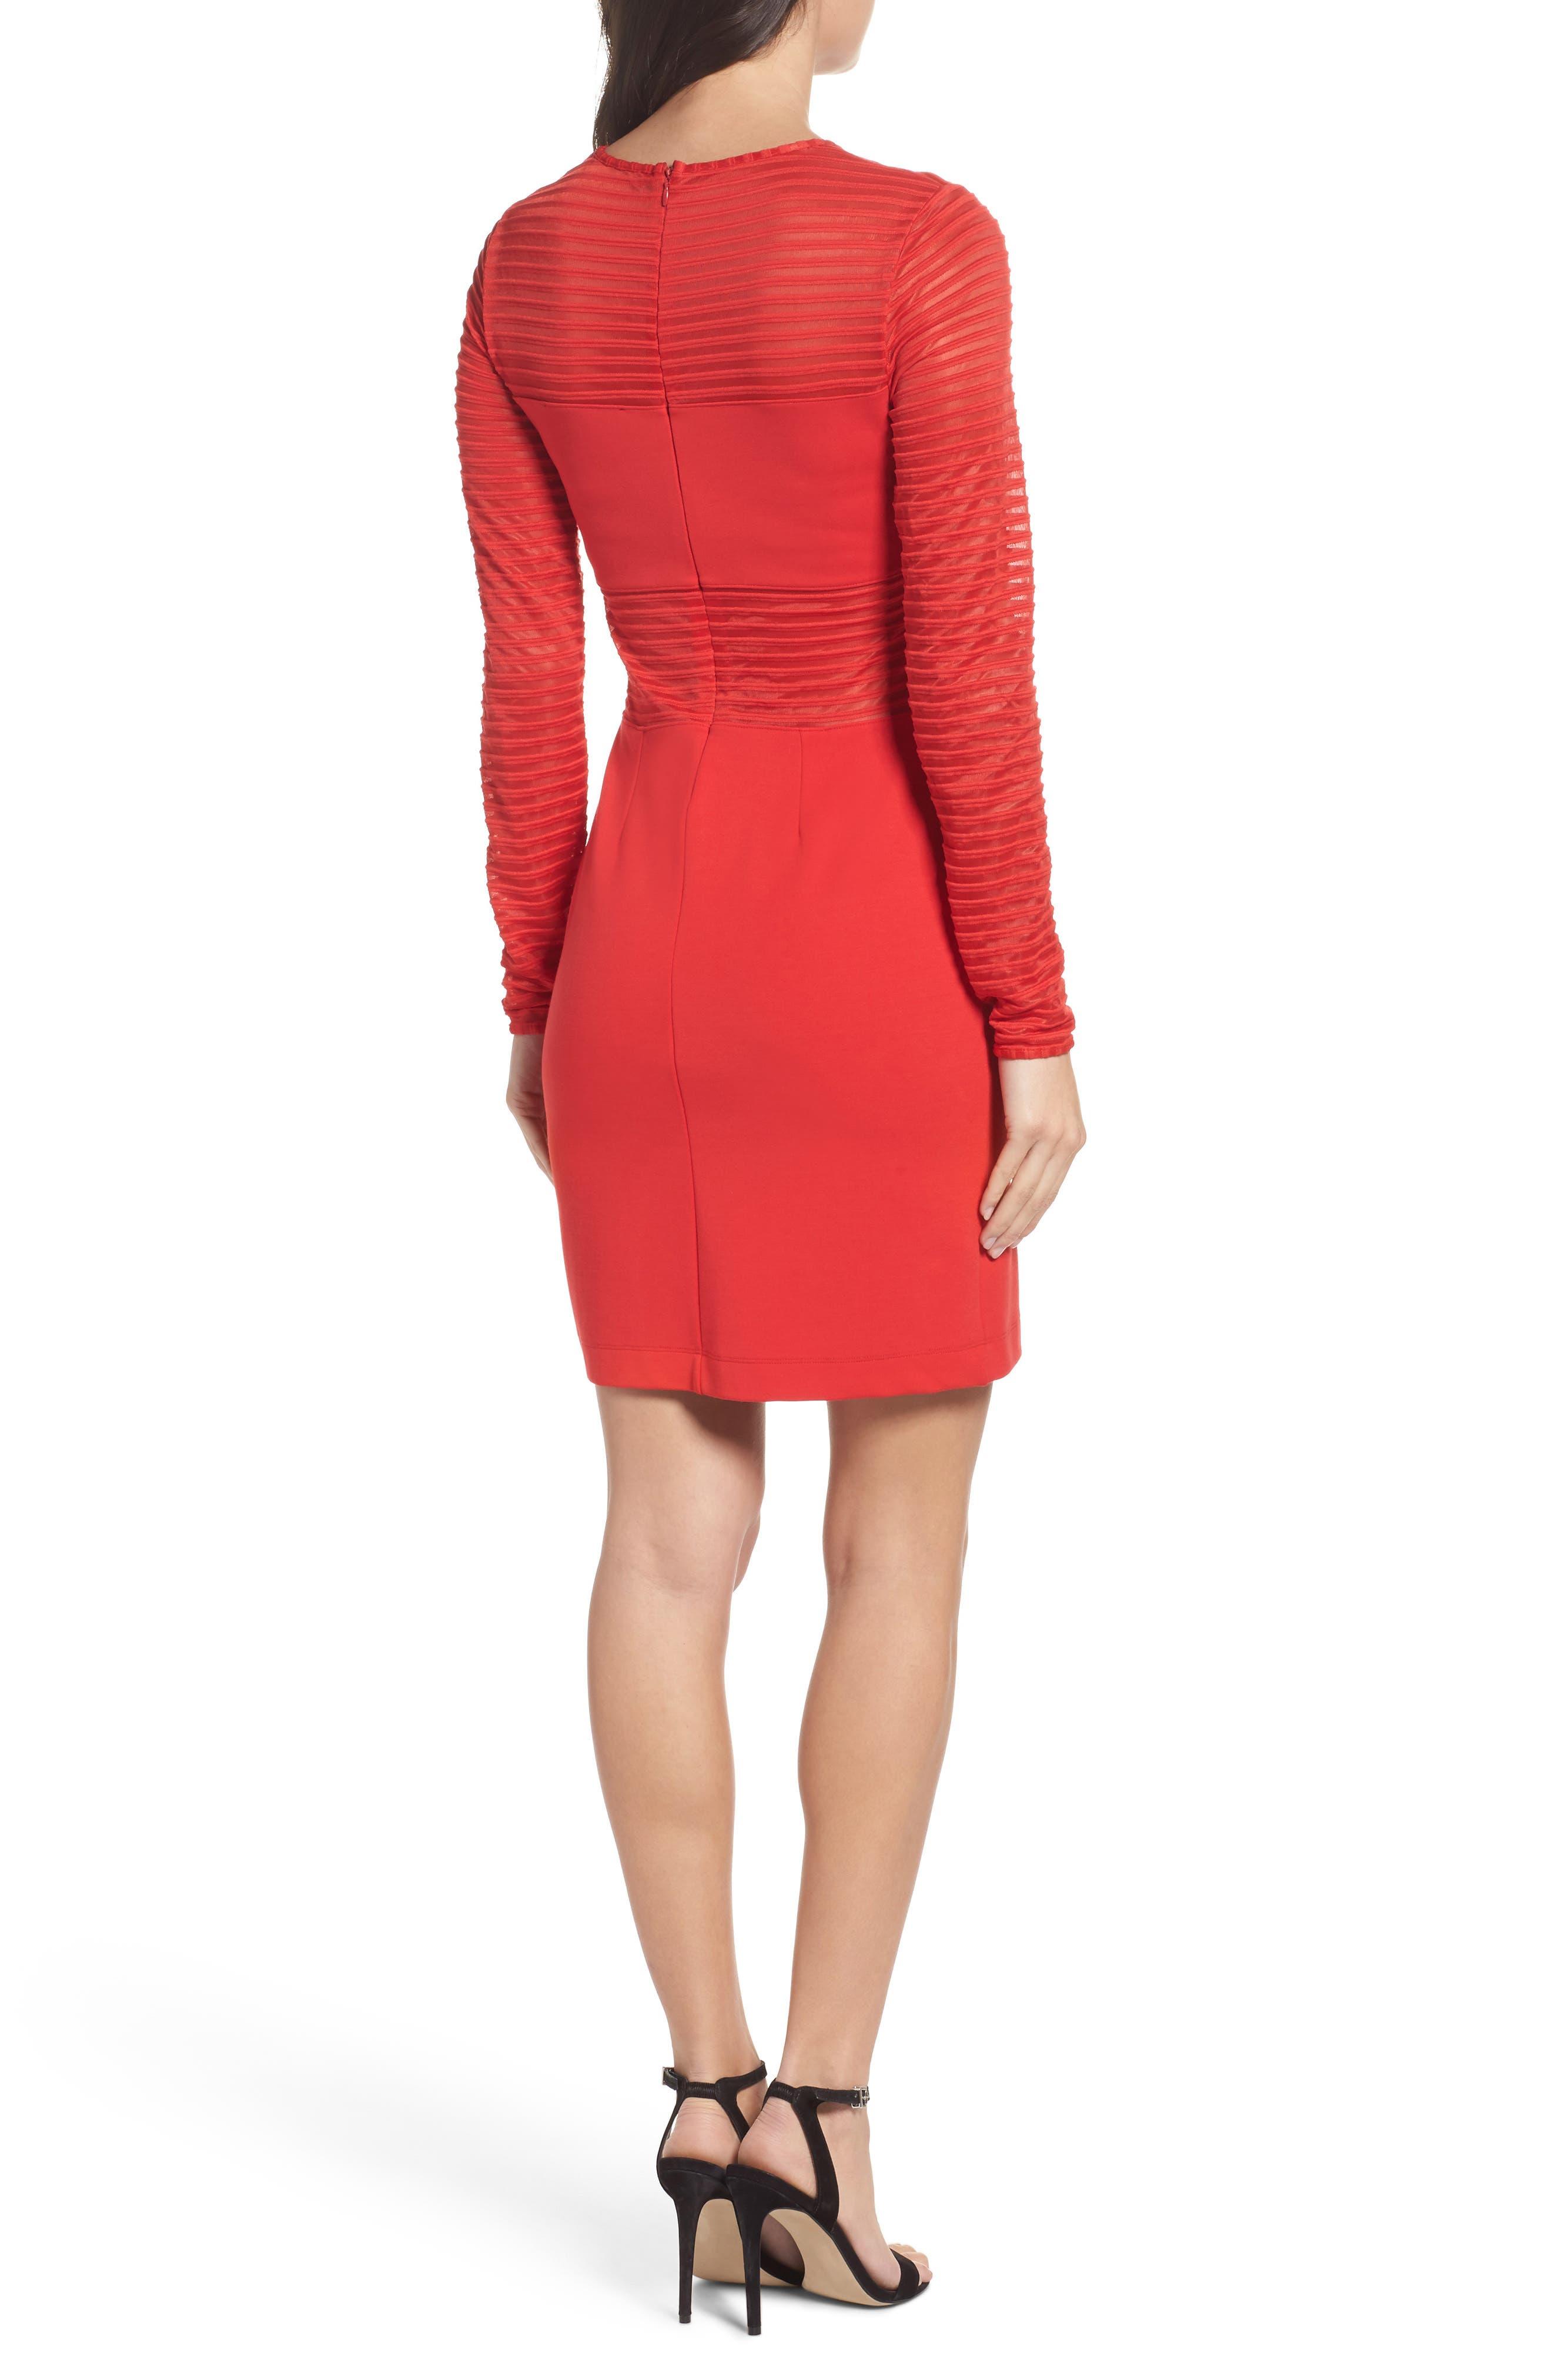 Thiestis Body-Con Dress,                             Alternate thumbnail 4, color,